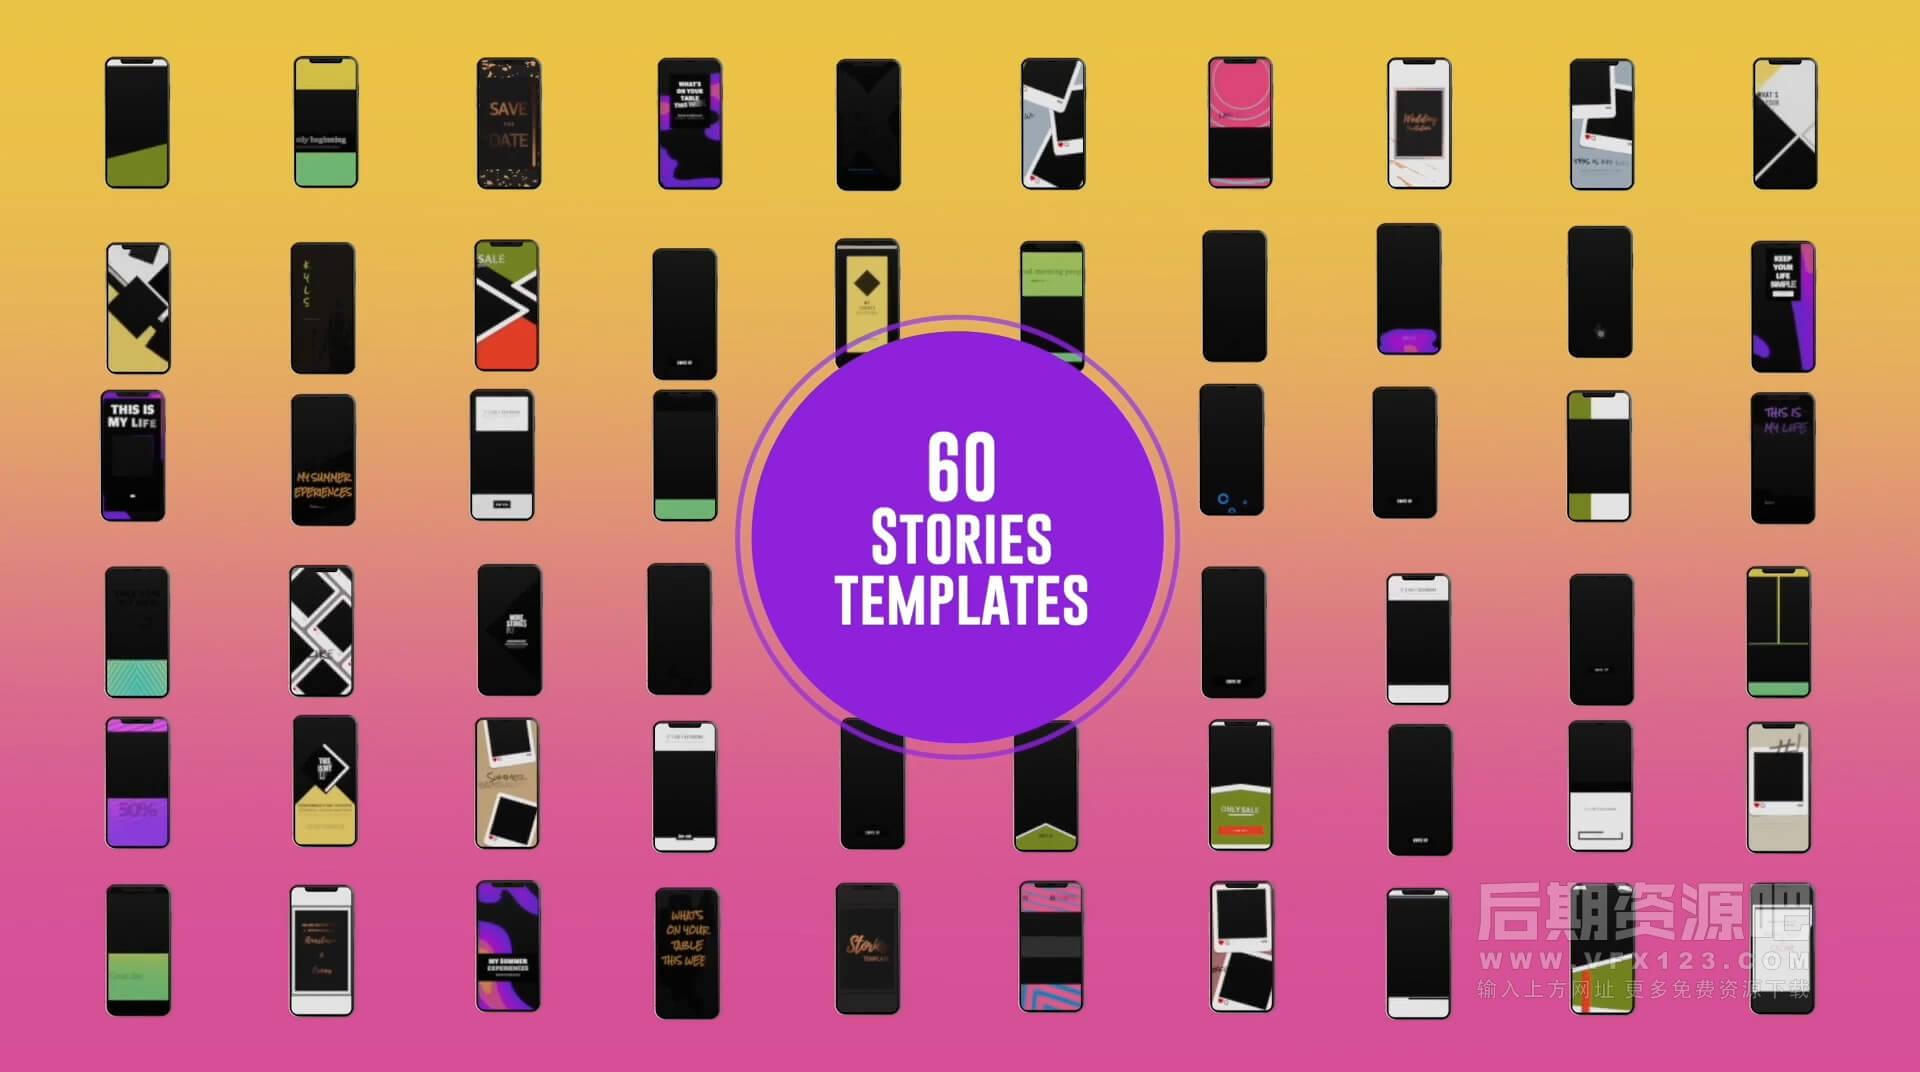 Fcpx插件 60个适用手机抖音快手社交媒体短视频竖屏模板 Moment Pop